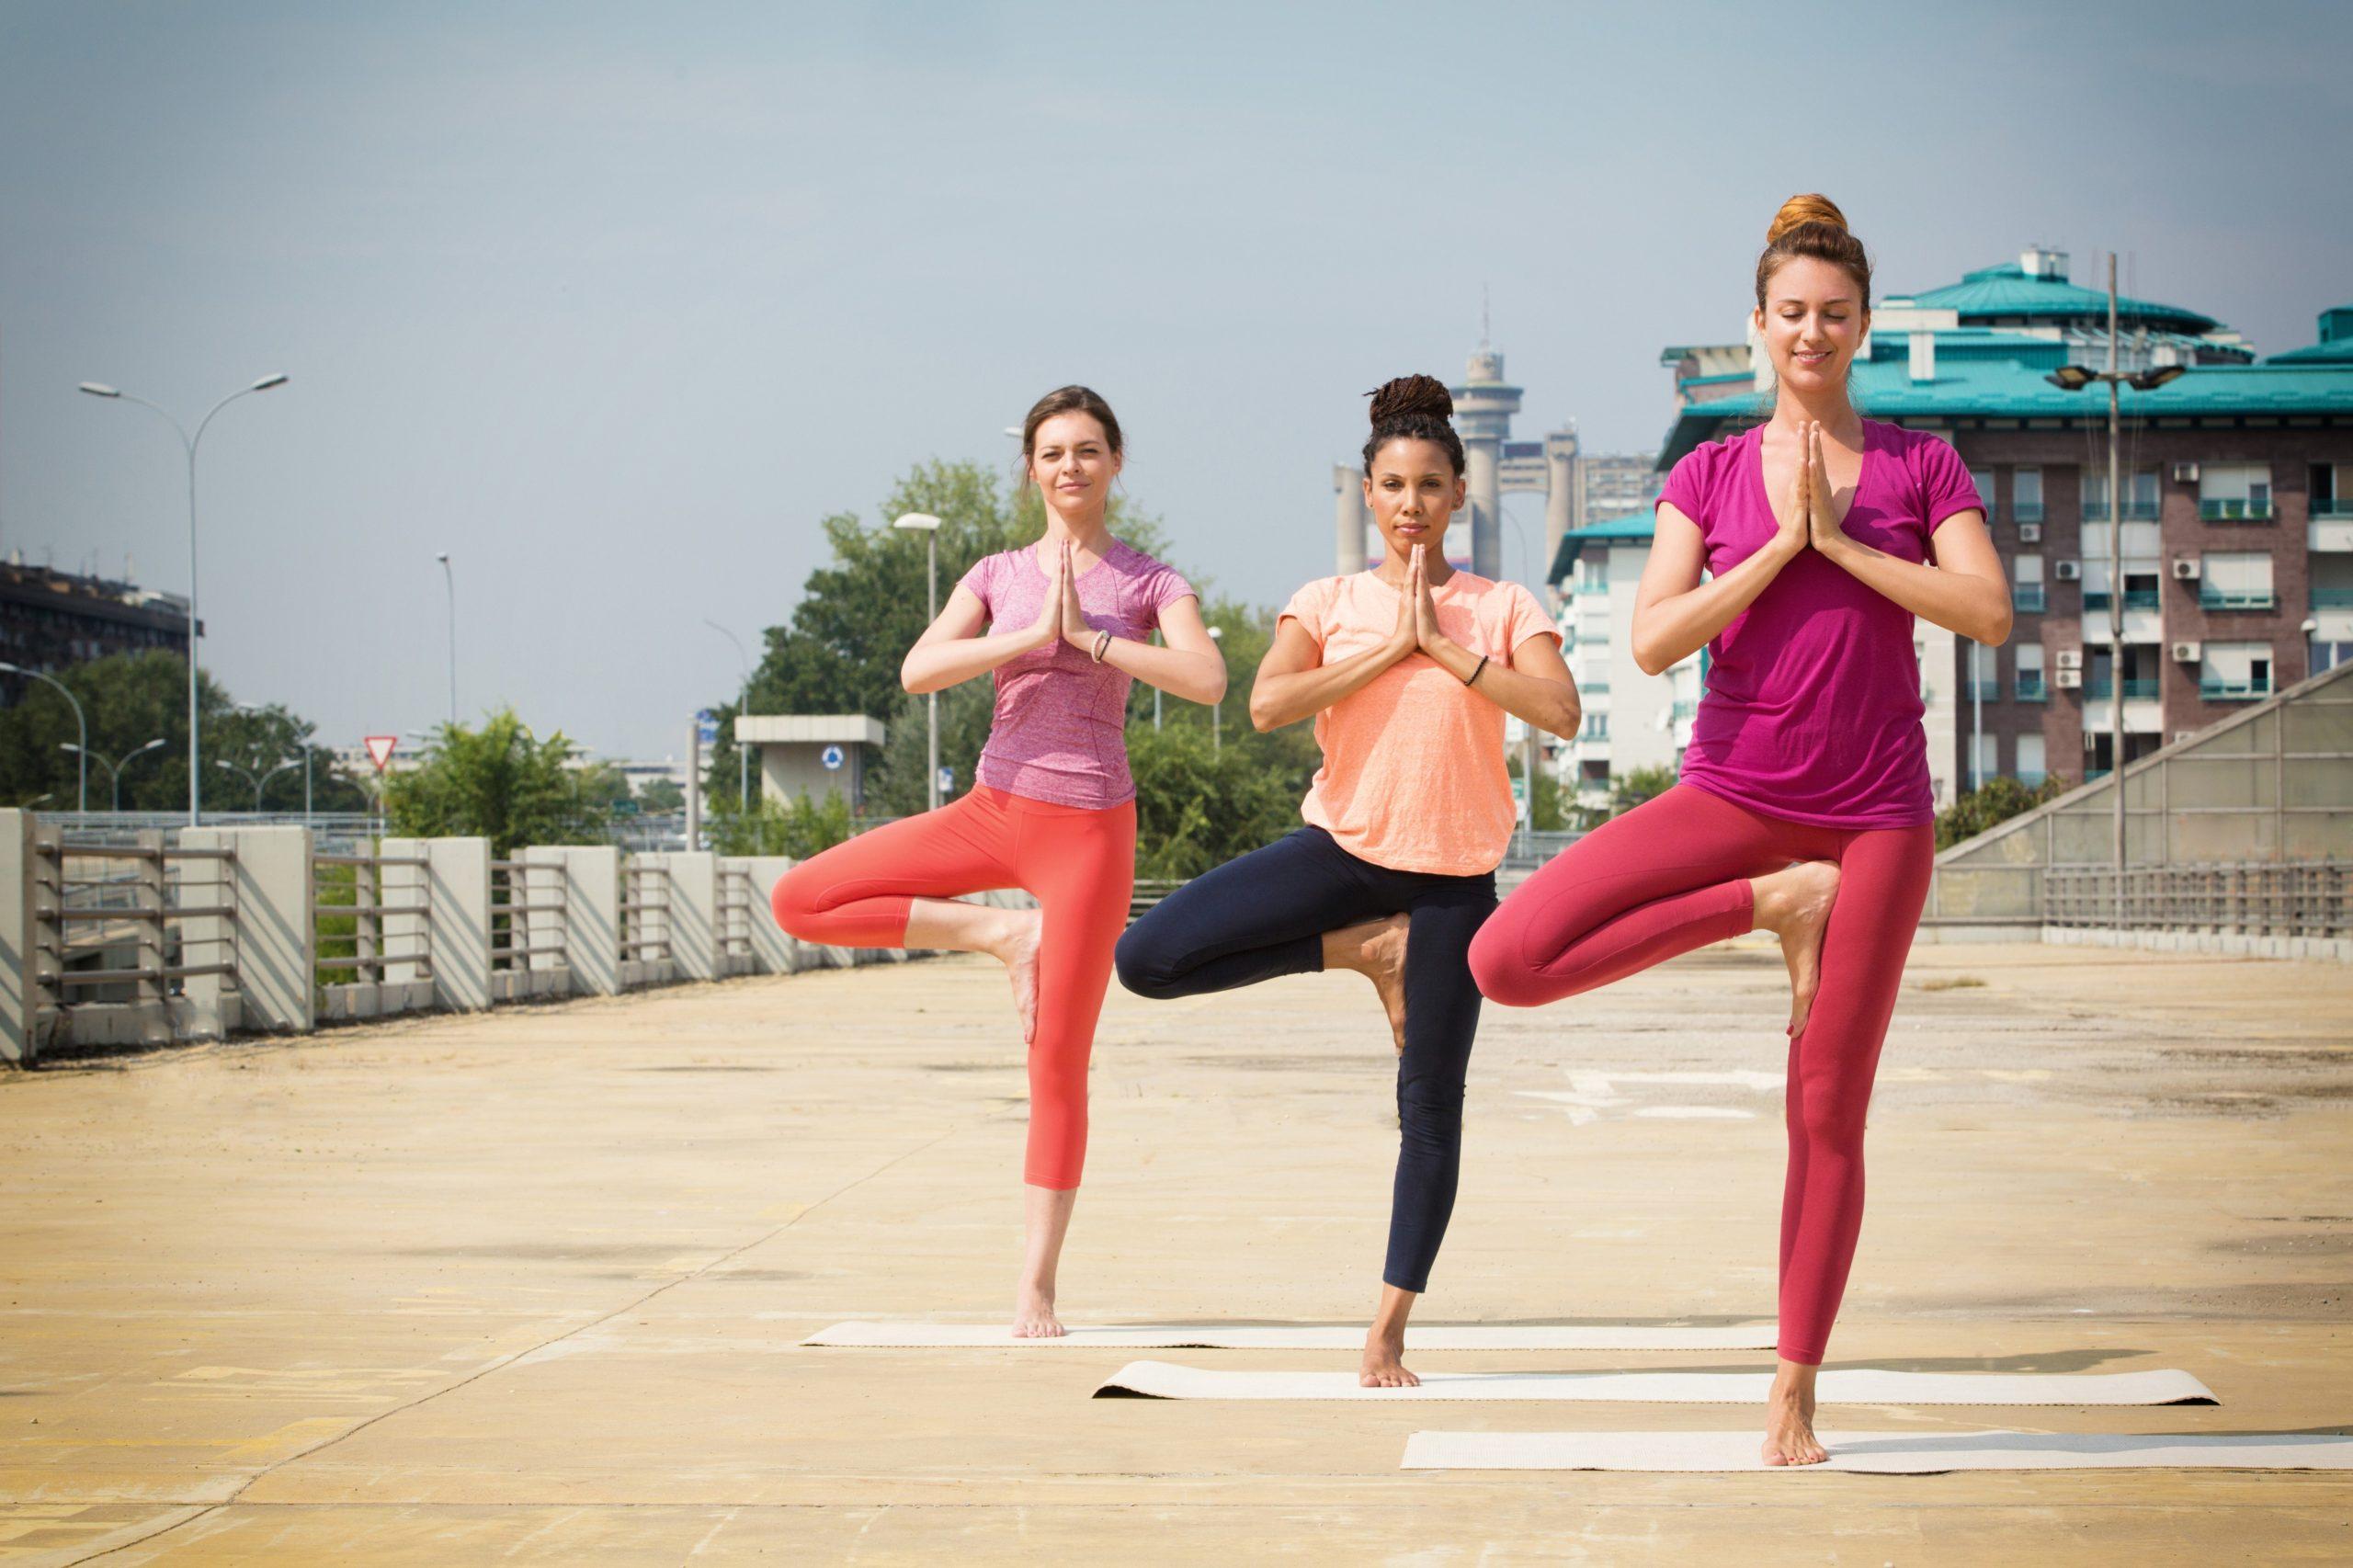 Women doing Yoga in an outdoor neighborhood